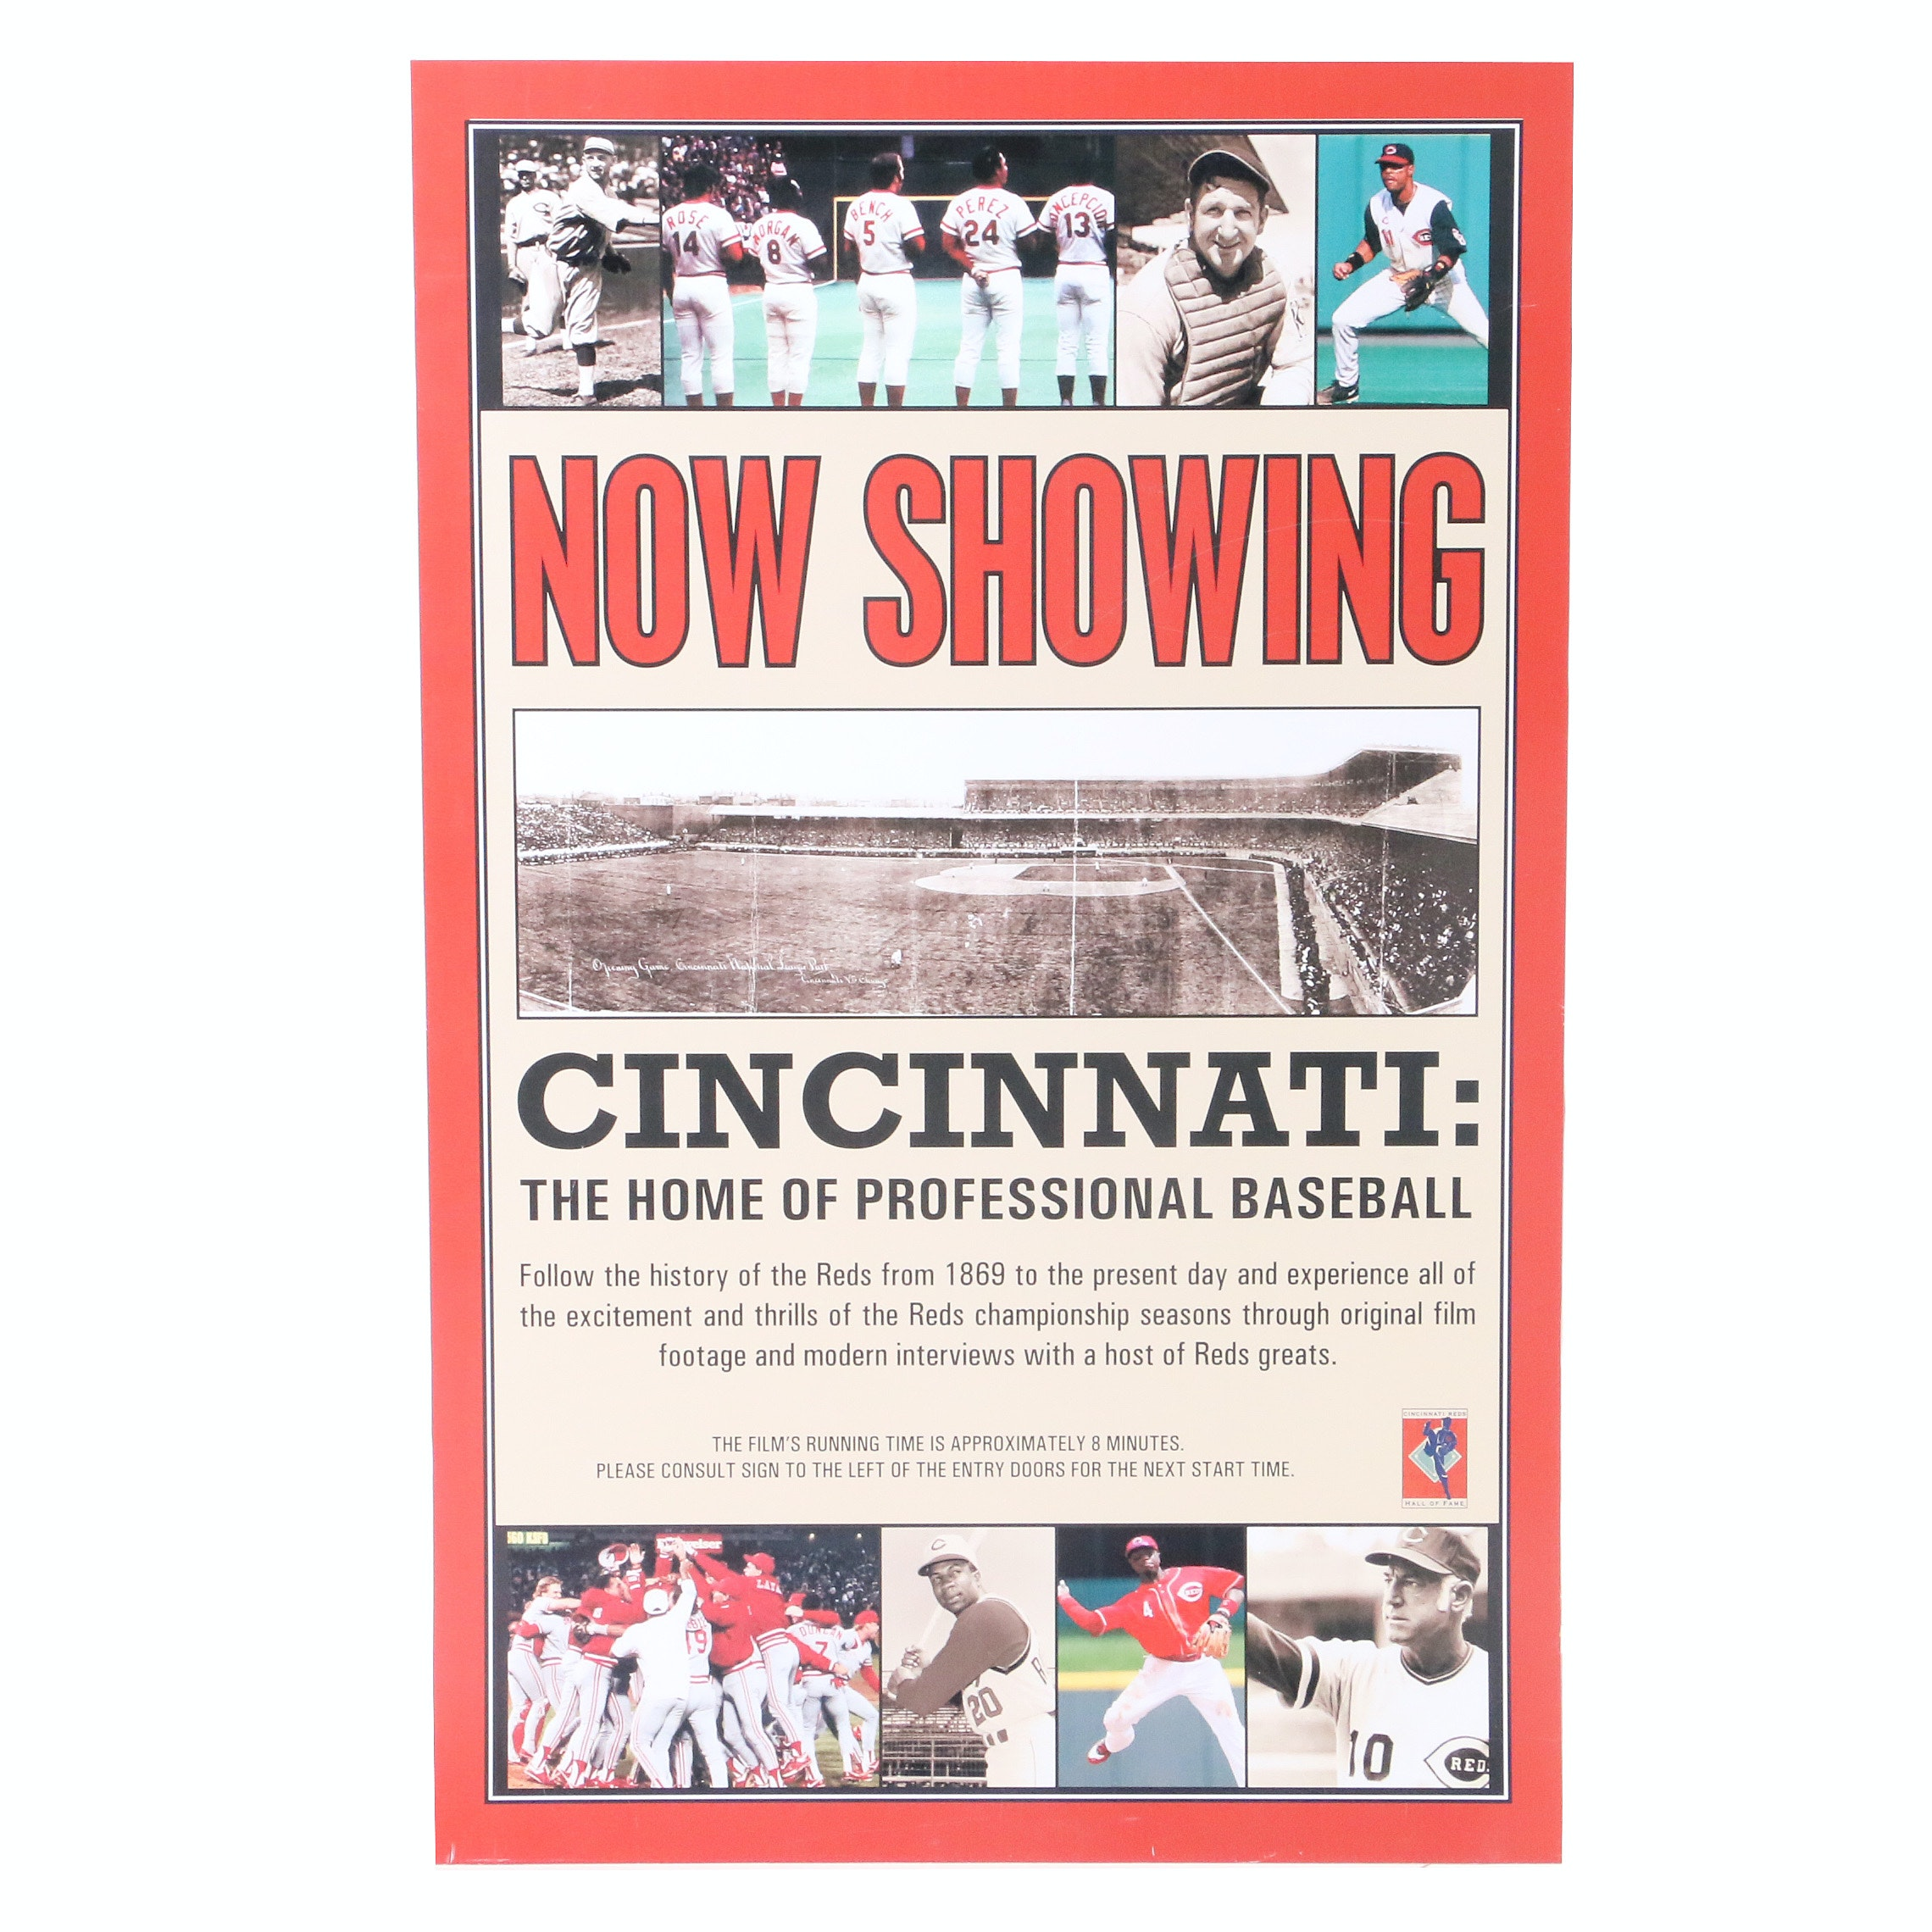 """Cincinnati Home of Professional Baseball"" Exhibit From Hall of Fame COA"